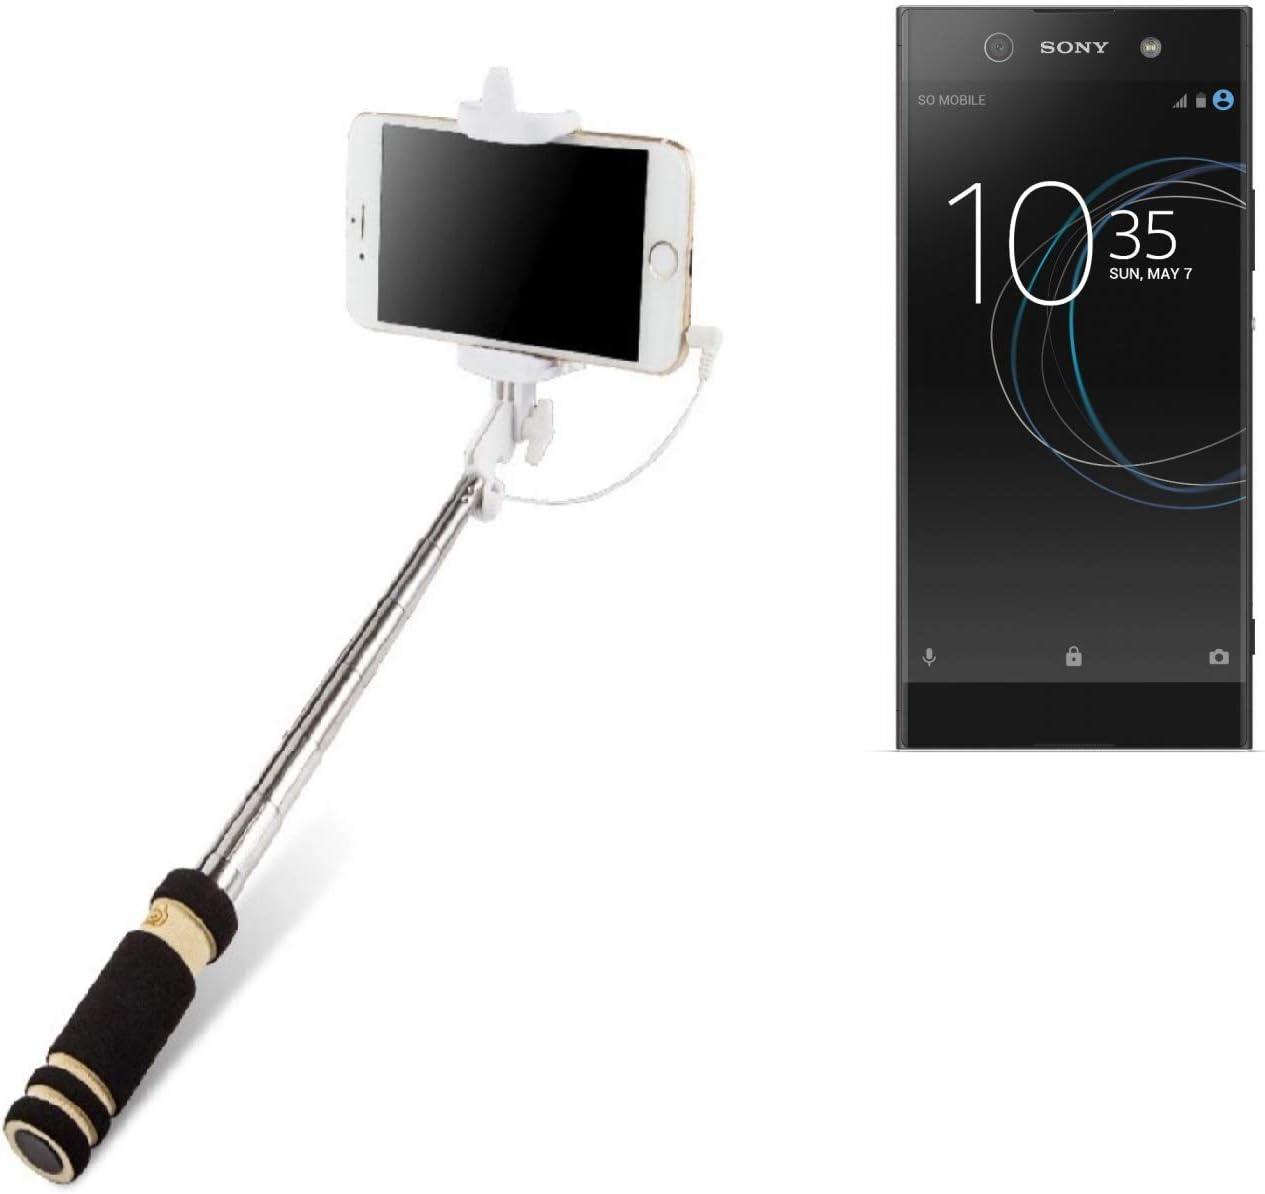 K-S-Trade Selfie Stick Palillo para Sony Xperia XA1 Ultra, Negro, Monopod, Mástil Telescópico, Autorretrato: Amazon.es: Electrónica